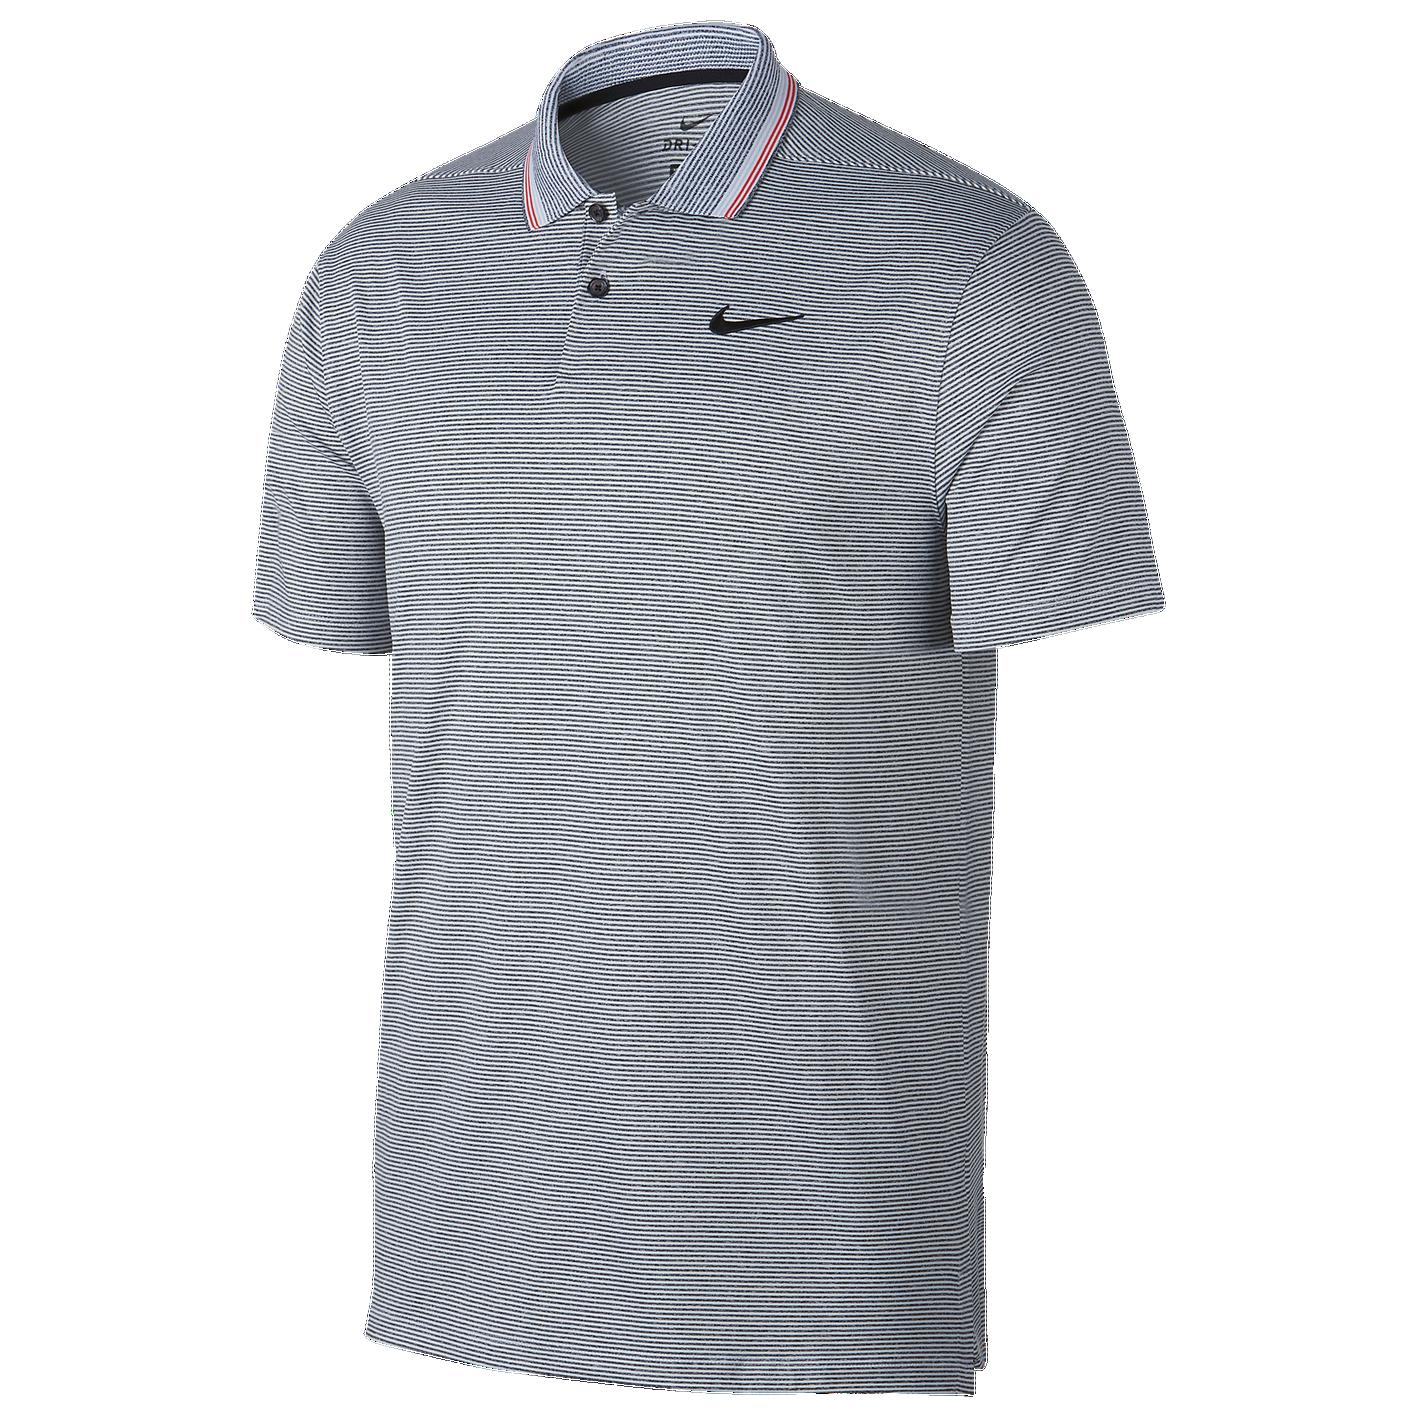 25bce8719 Nike Dry Vapor Control Golf Polo - Men s - Golf - Clothing - Black Pure